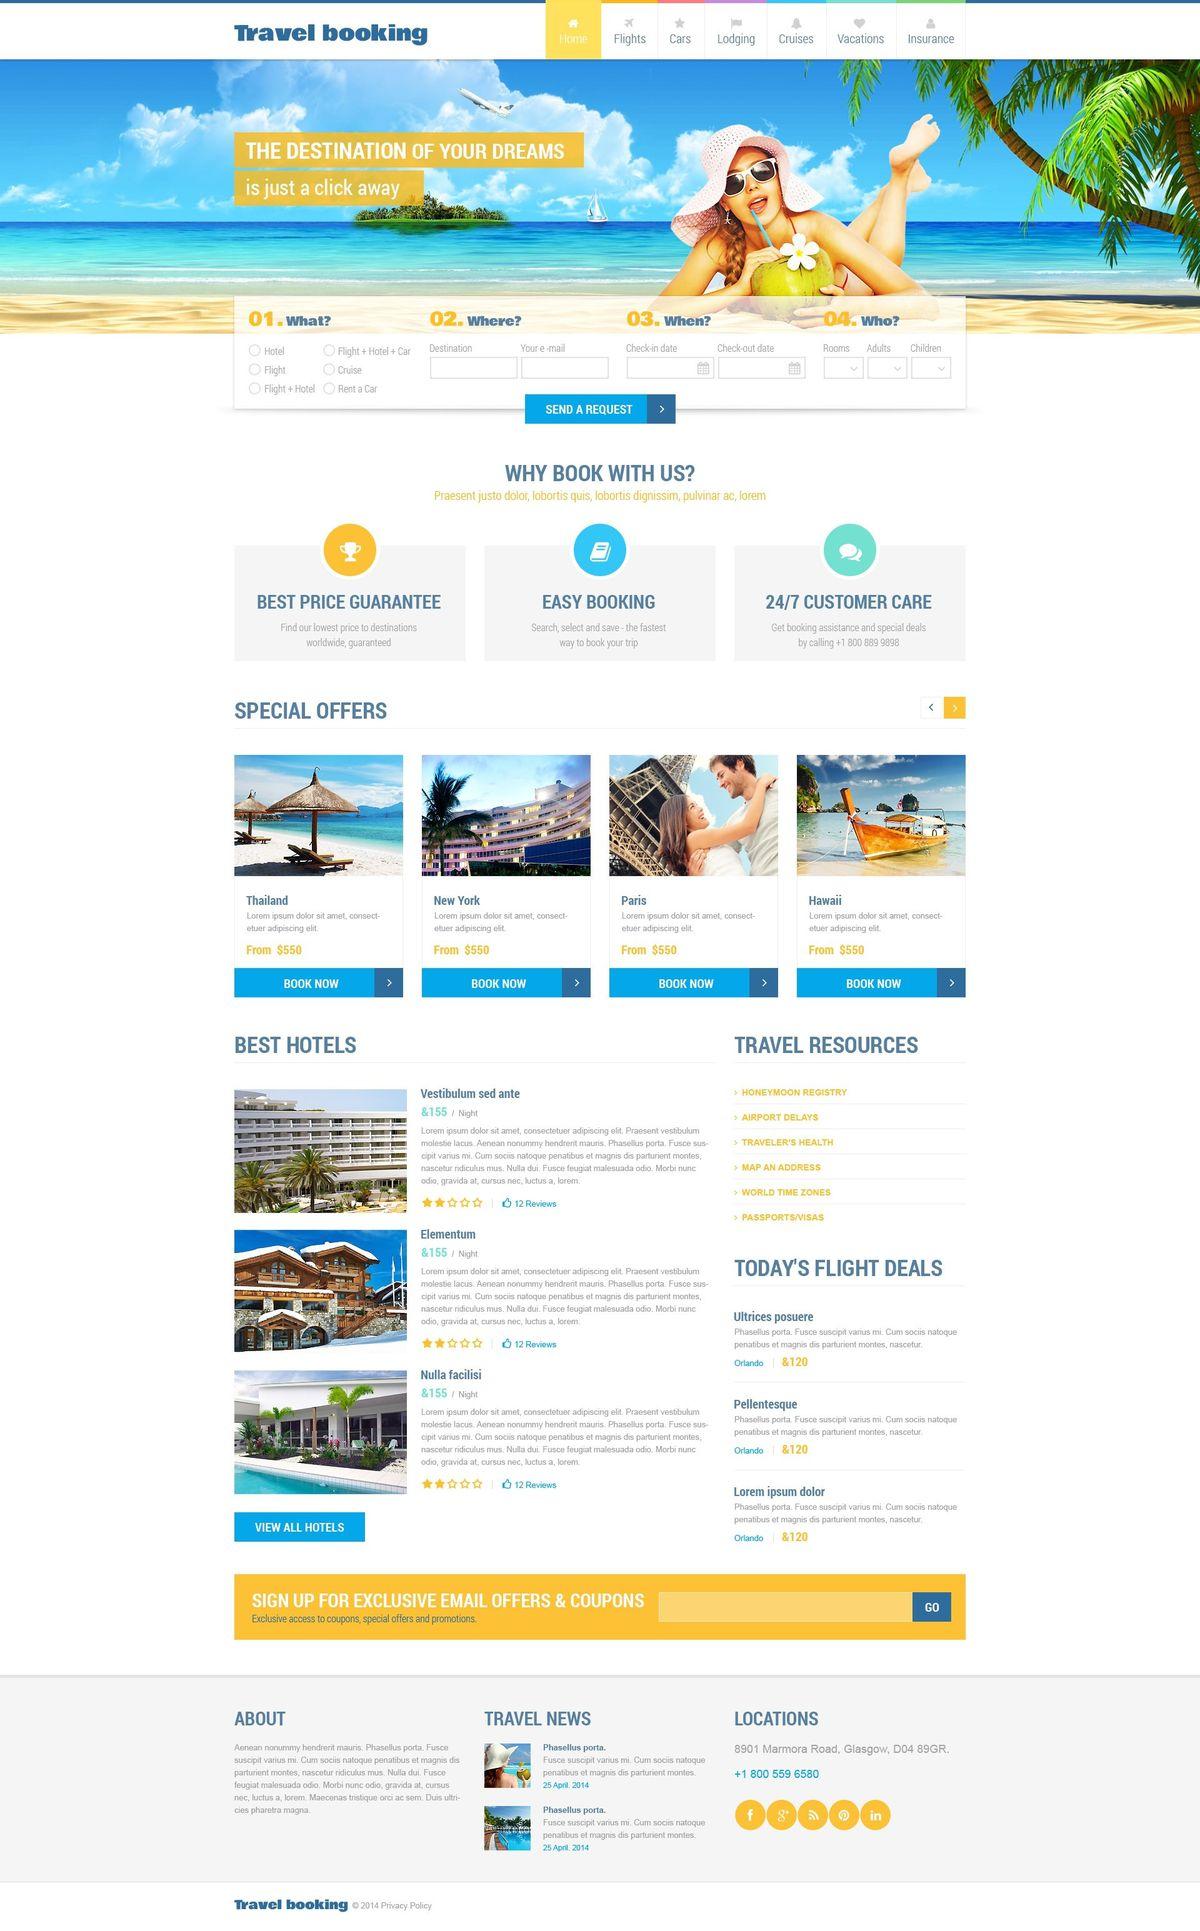 Airline Tickets Website Templates | TemplateMonster